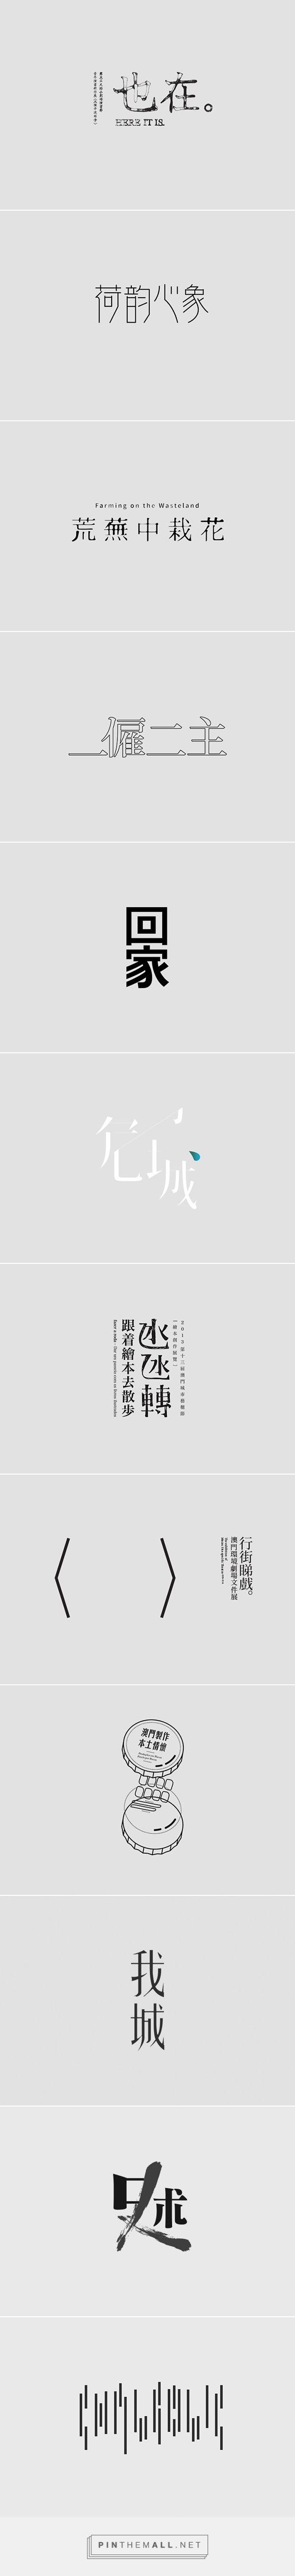 logotype   Ck Chiwai Cheang